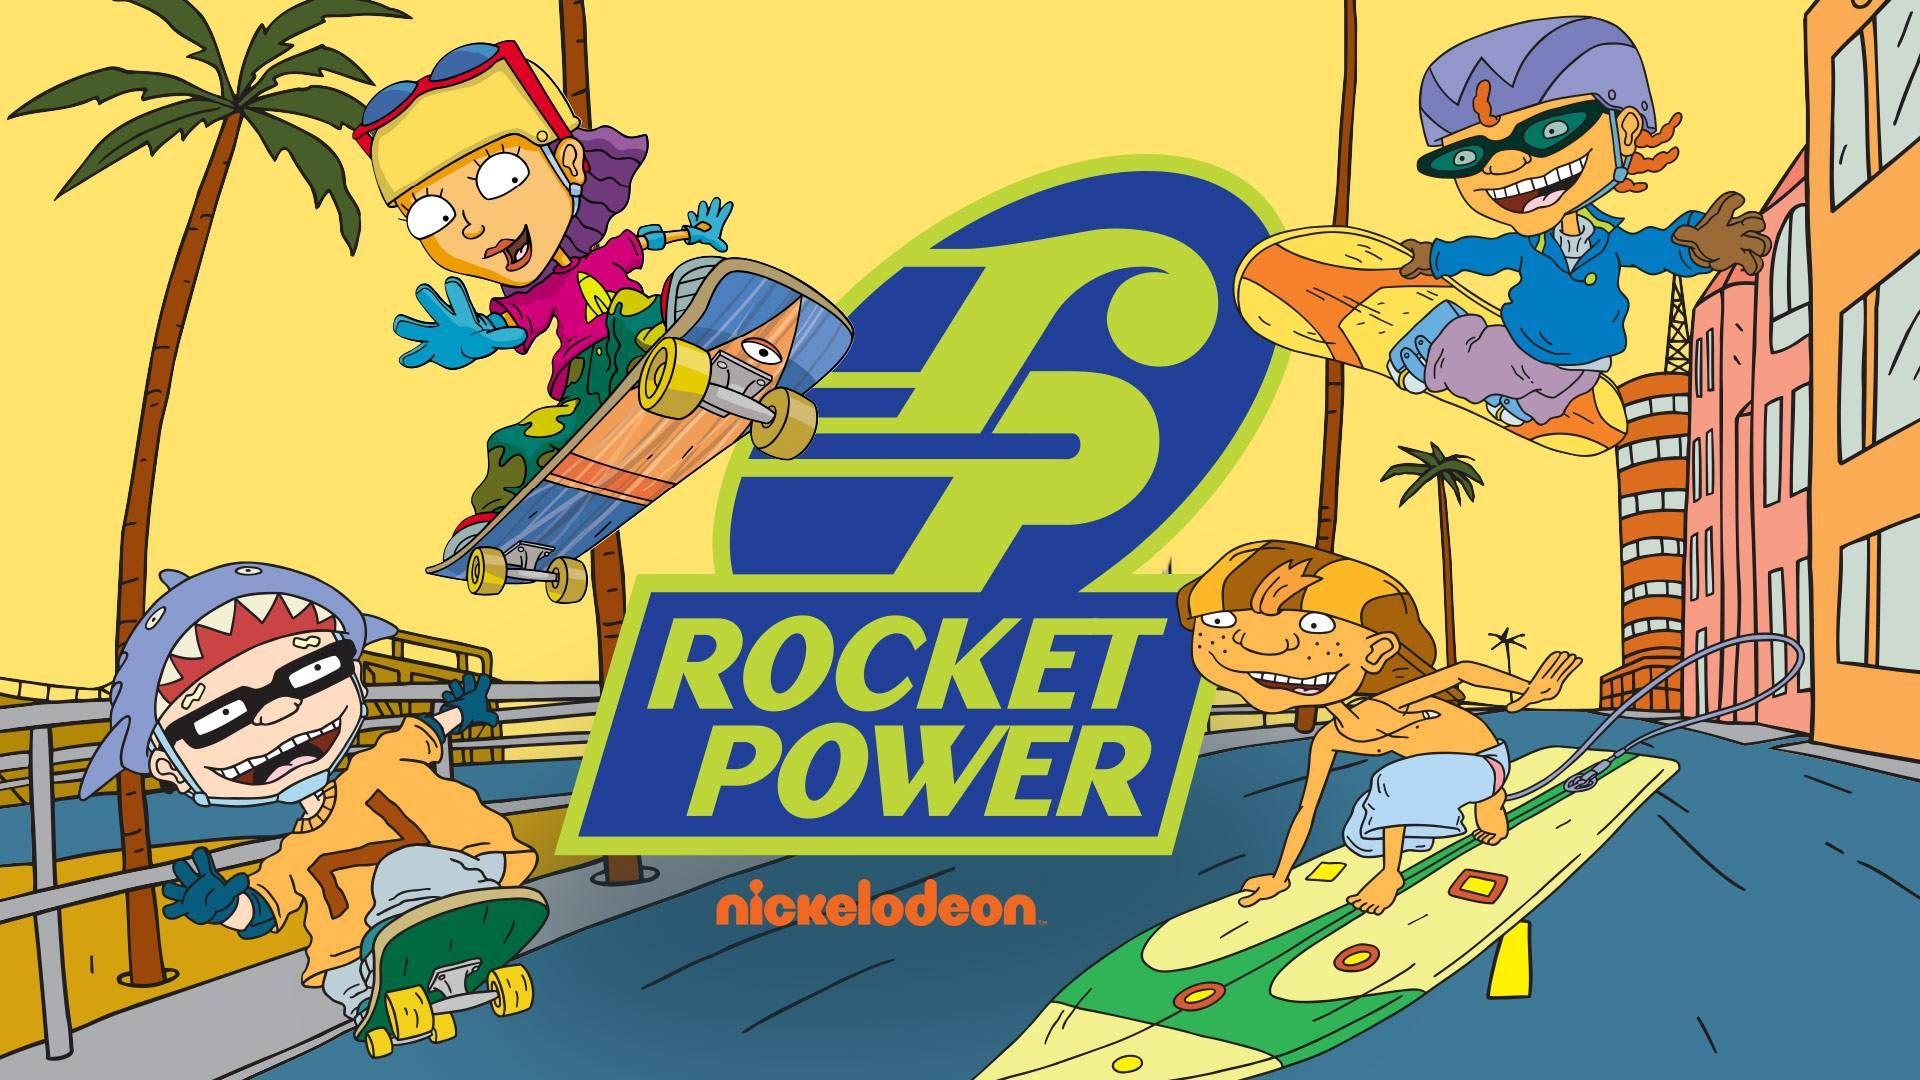 Rocket Power Rocket Power Cool Cartoons Cartoon